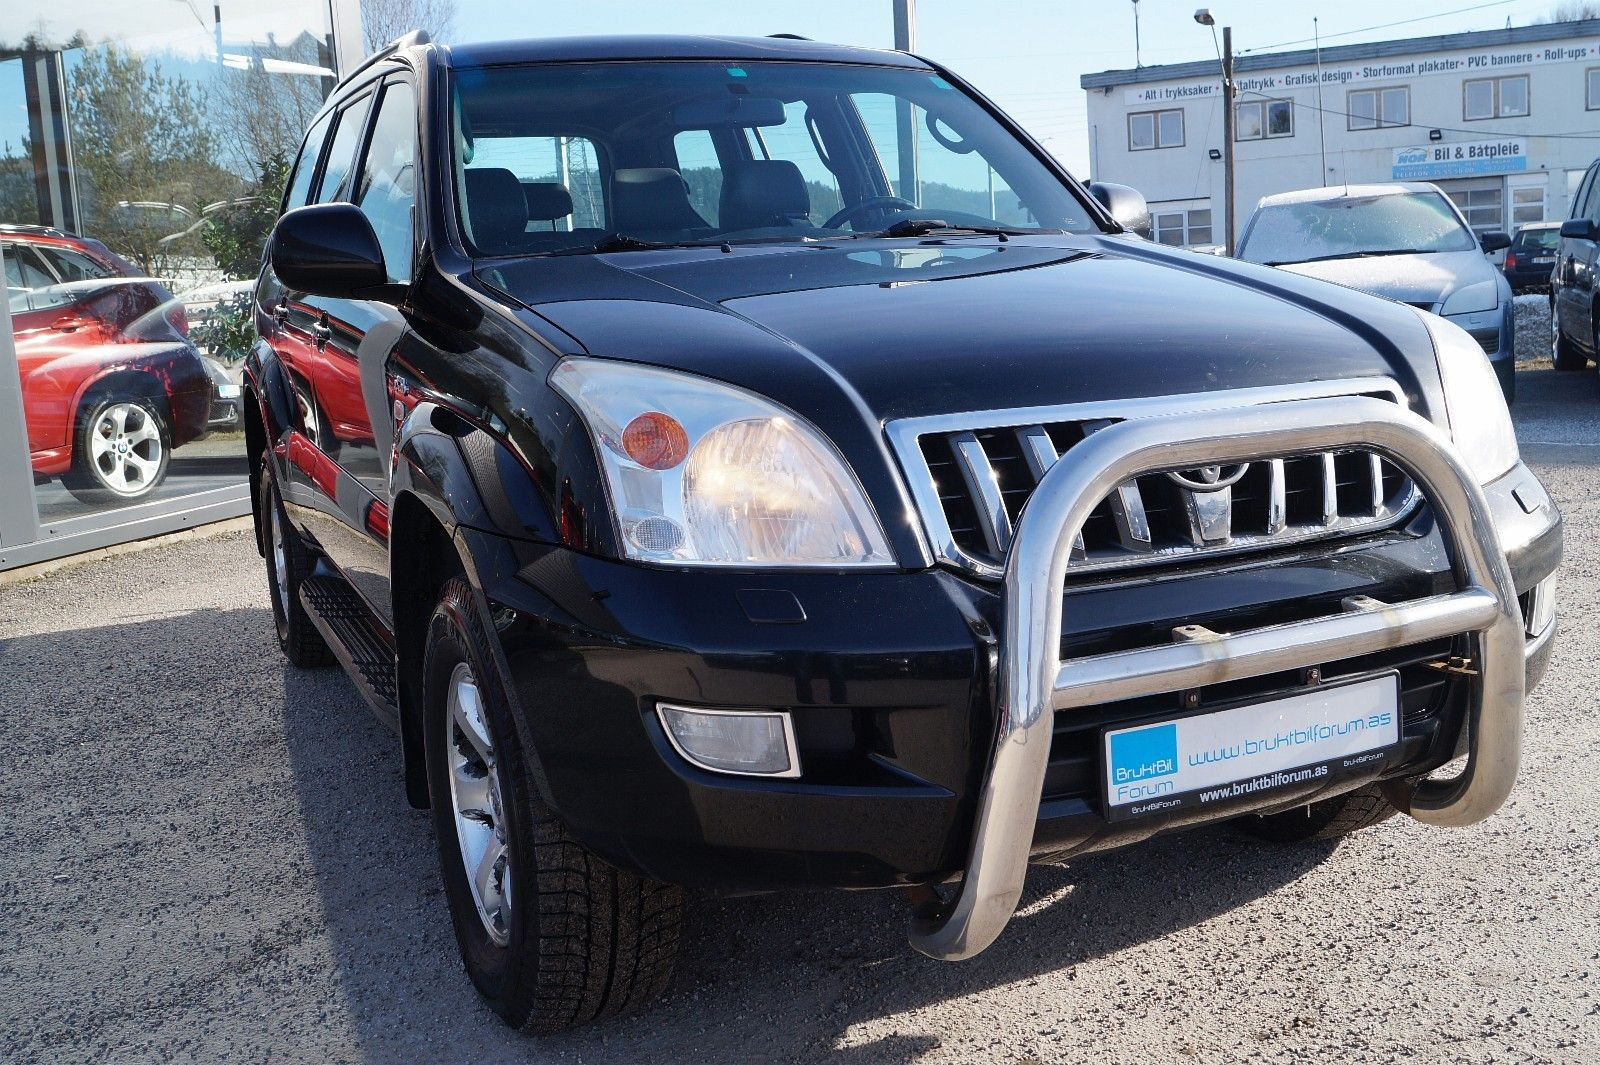 (1) FINN – Toyota Land Cruiser